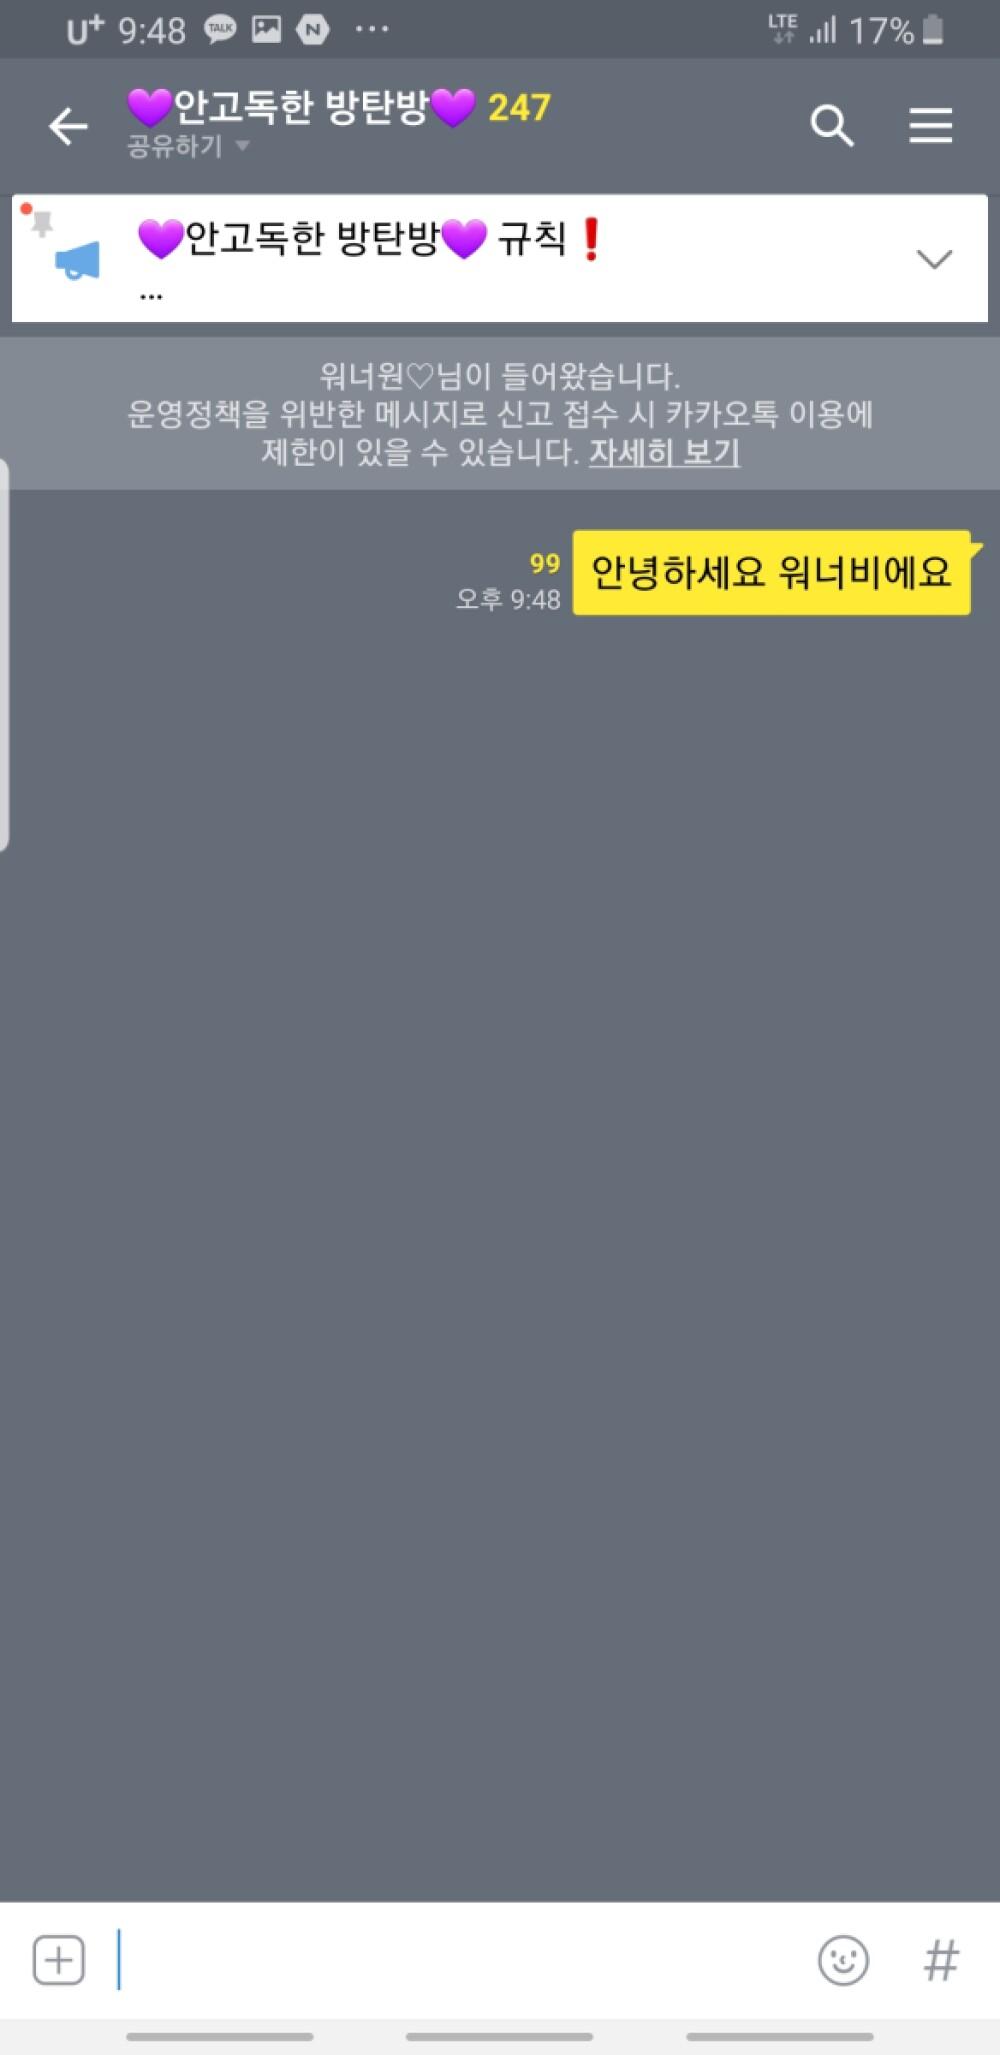 Screenshot_20190921-214833_KakaoTalk.jpg